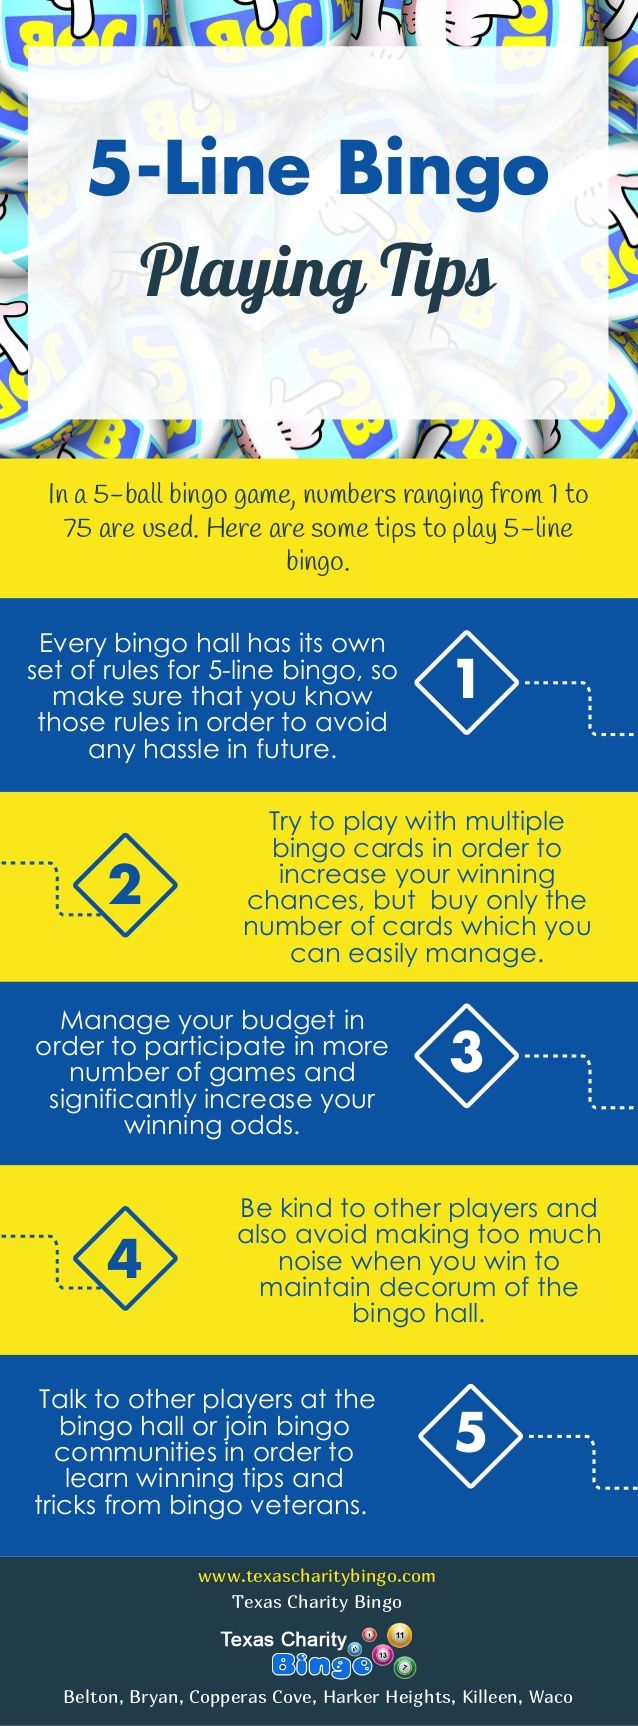 Pin By Texas Charity Bingo On Bingo Halls In Waco Tx